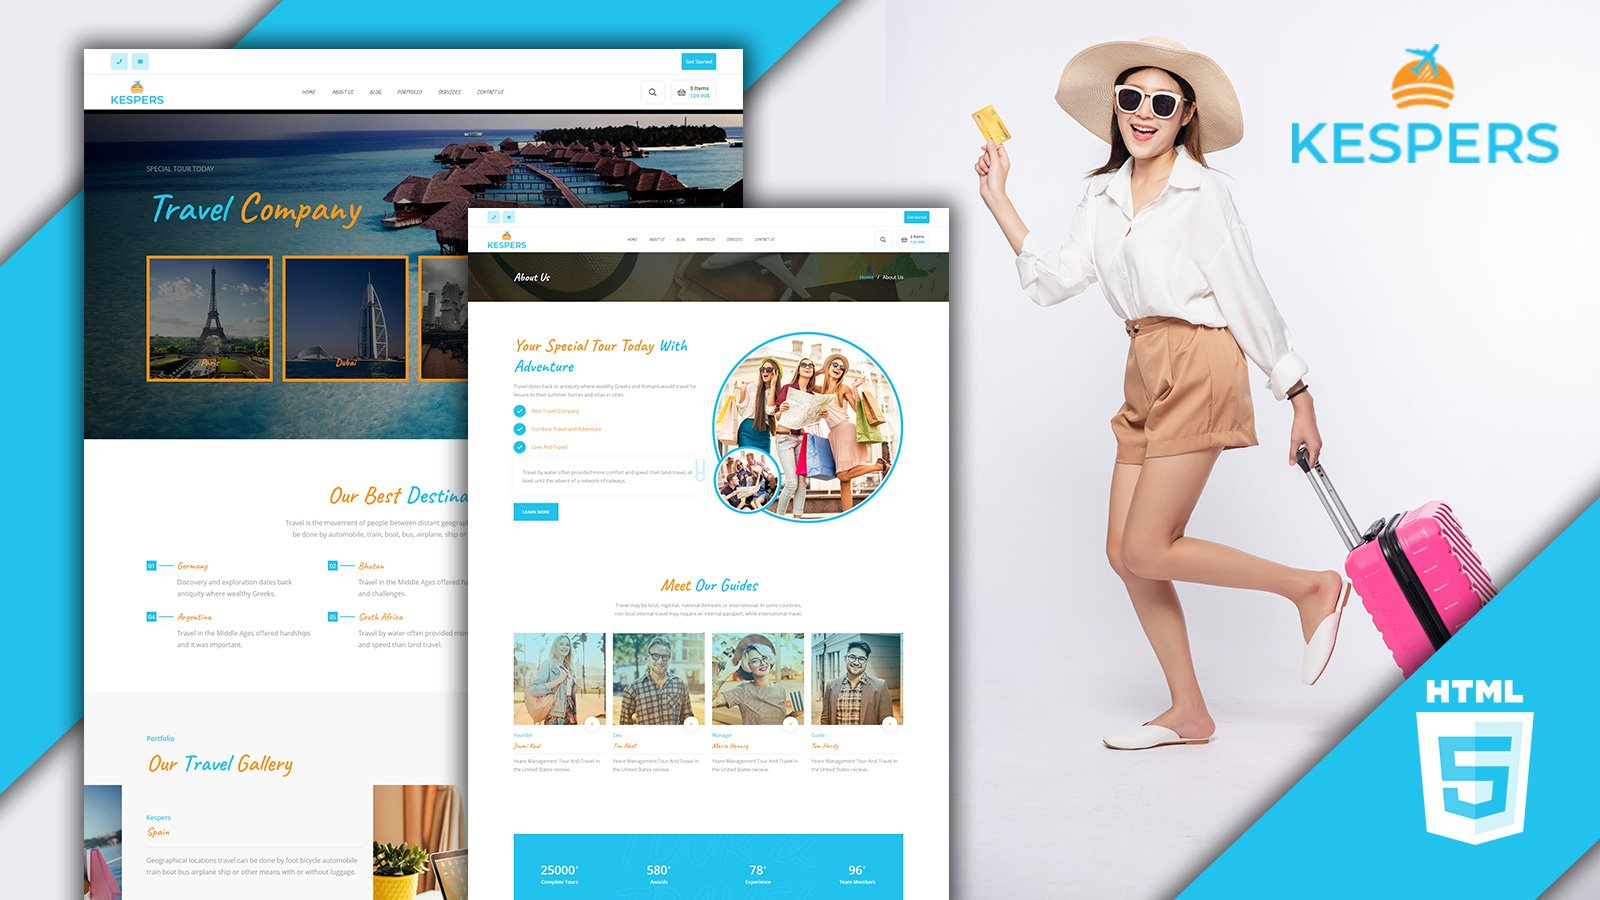 Kespers Traveling Agency HTML5 Website Template